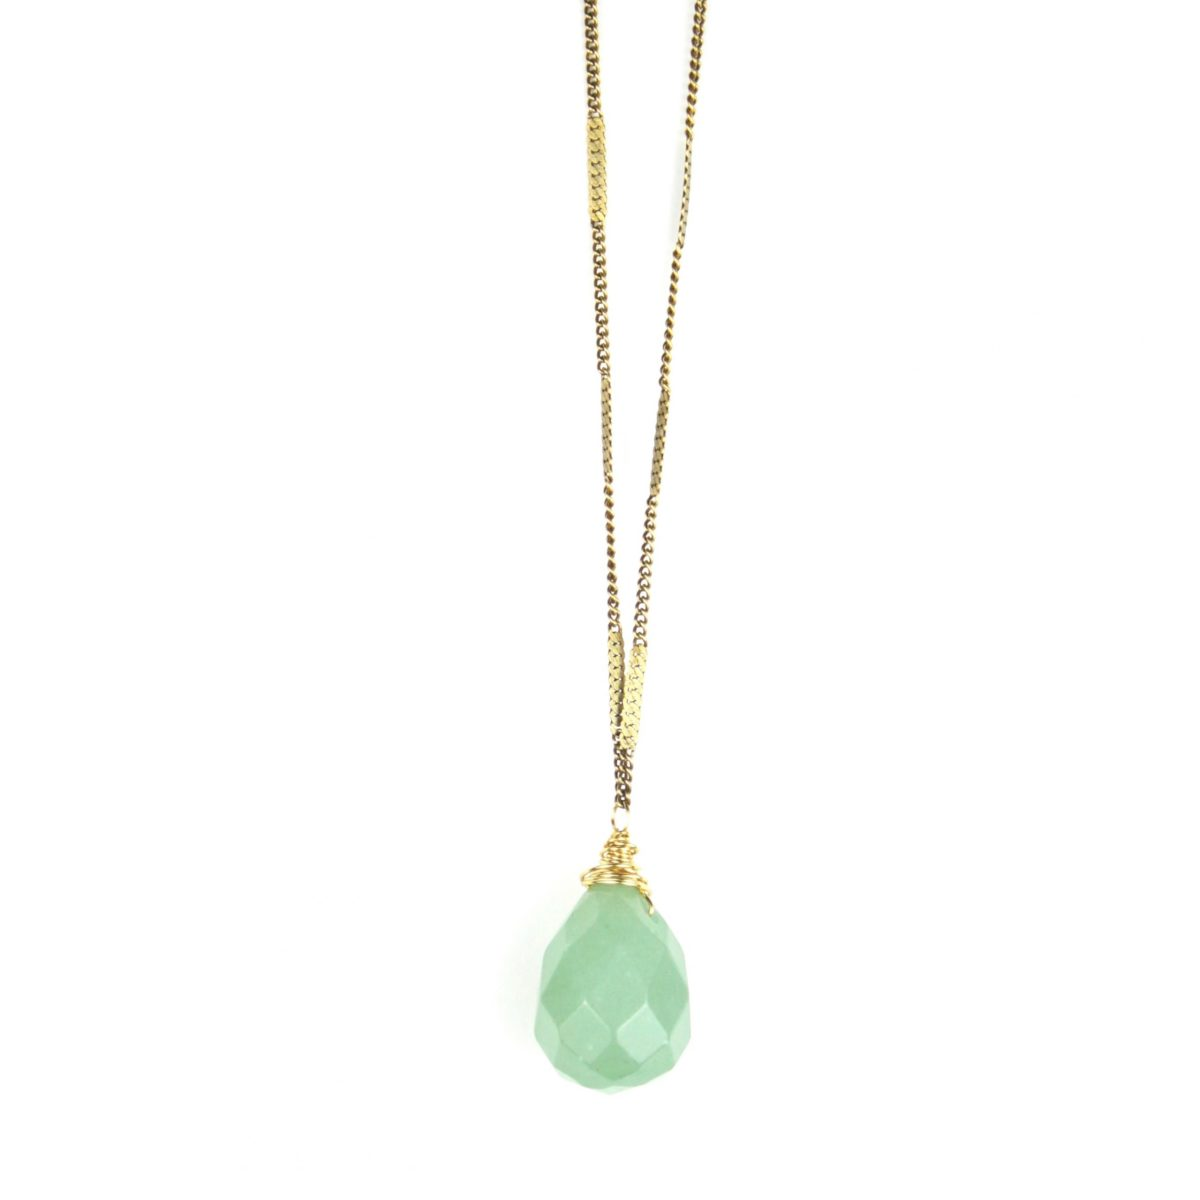 drop-necklace-green-aventurine